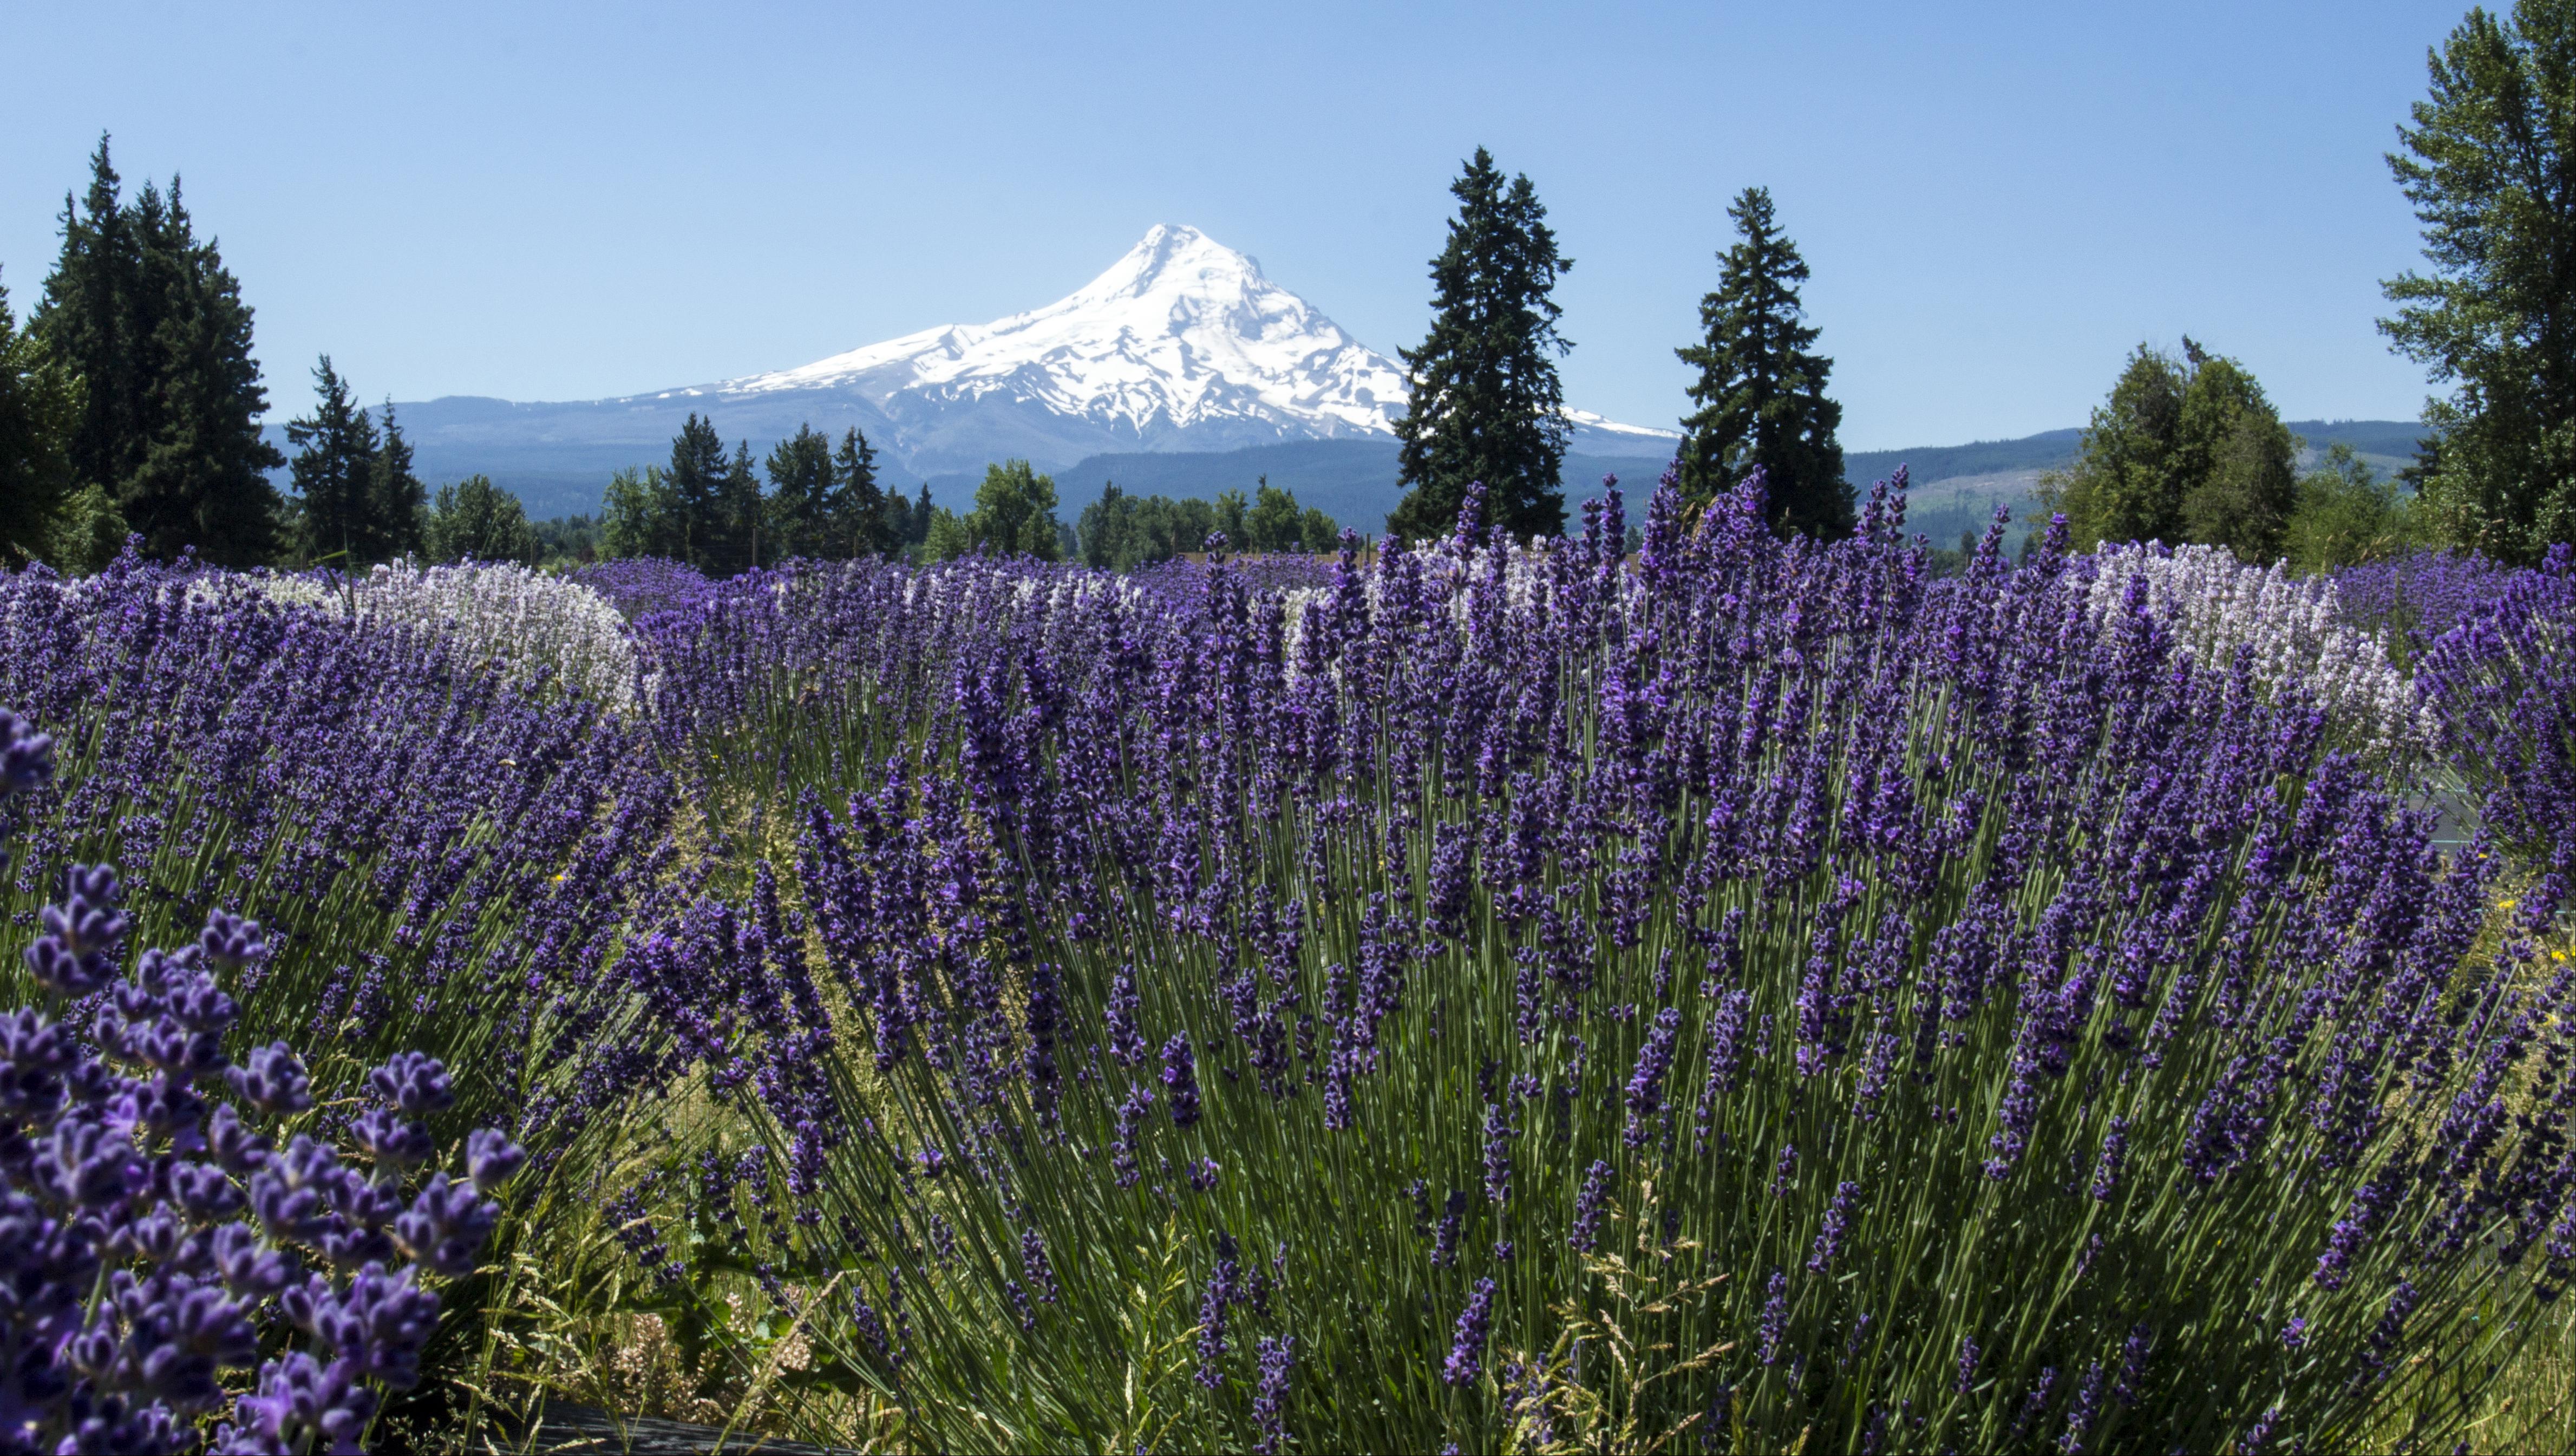 Lavender Valley, Mt. Hood, Oregon, Farm, Purple, Trees, Tree, HQ Photo